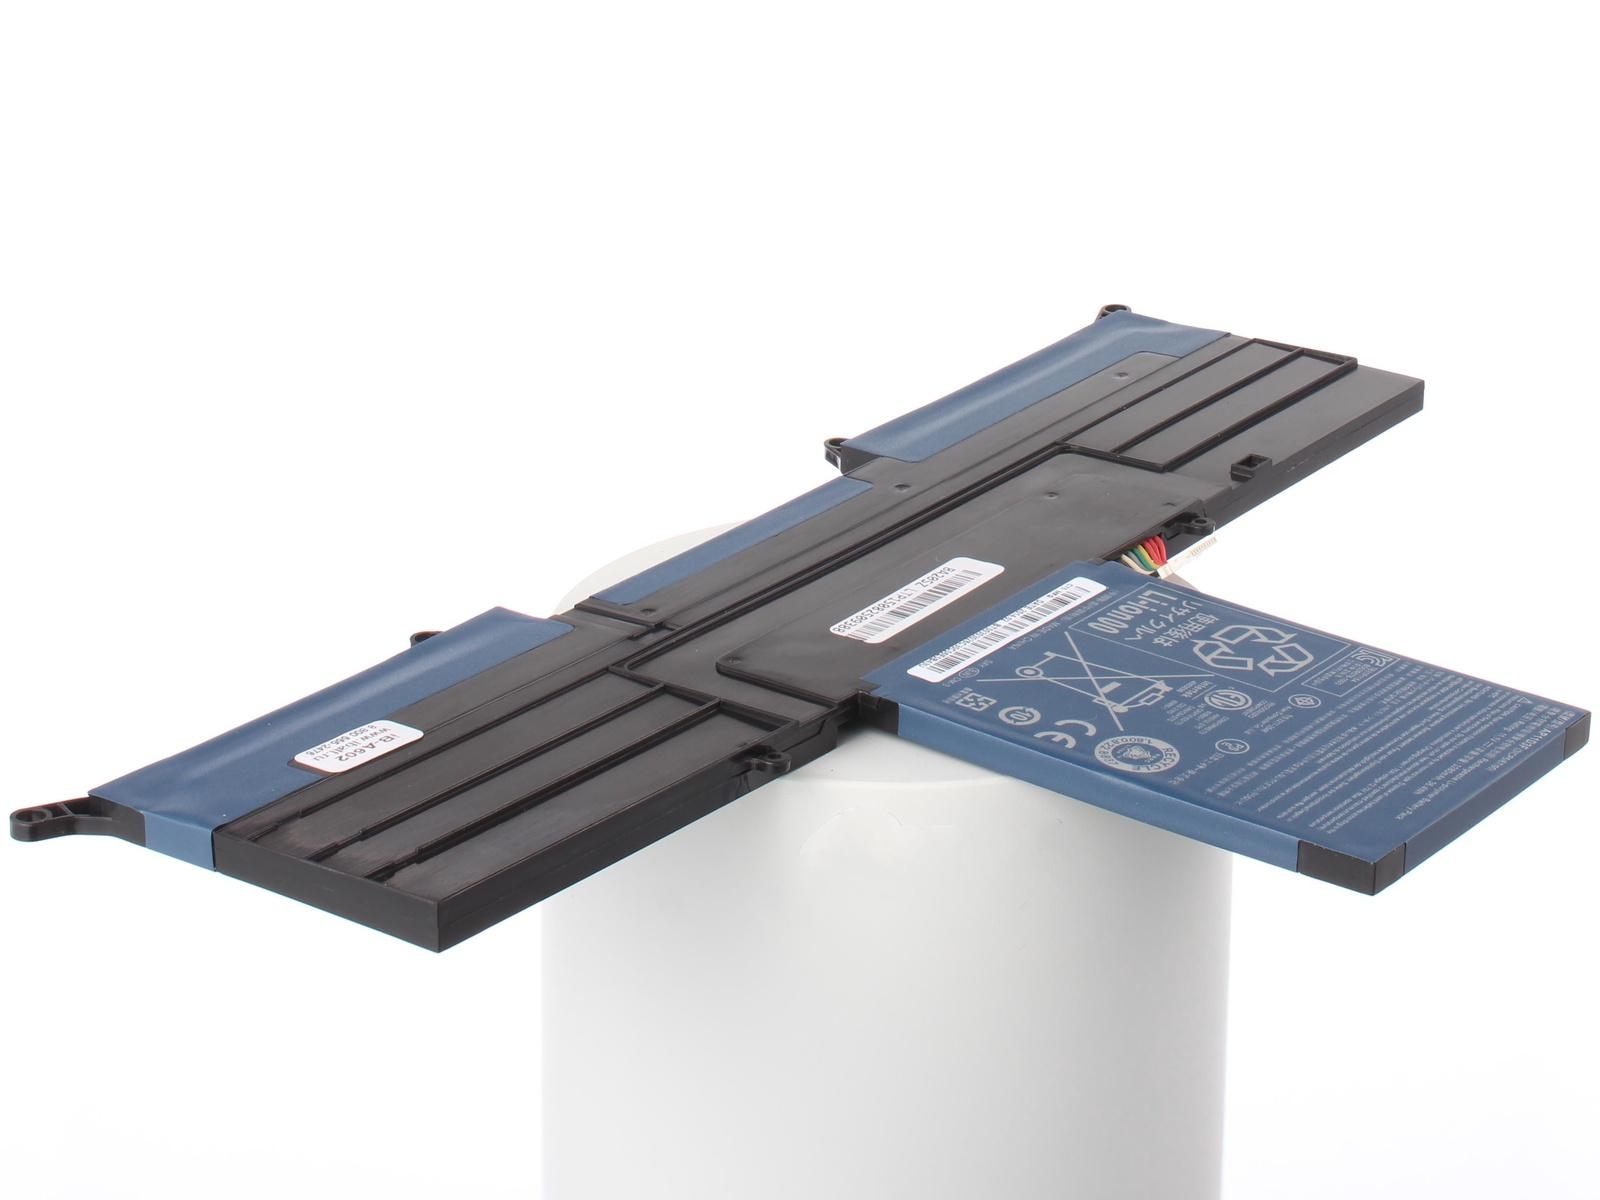 Аккумулятор для ноутбука iBatt Acer Aspire S3-331-987B4G50Add, S3-951-2634G24iss, S3-951-2634G25nss, S3-391-323a4G34add, S3-951-2464G24iss, S3-951-2464G25nss, S3-951-2634G52iss